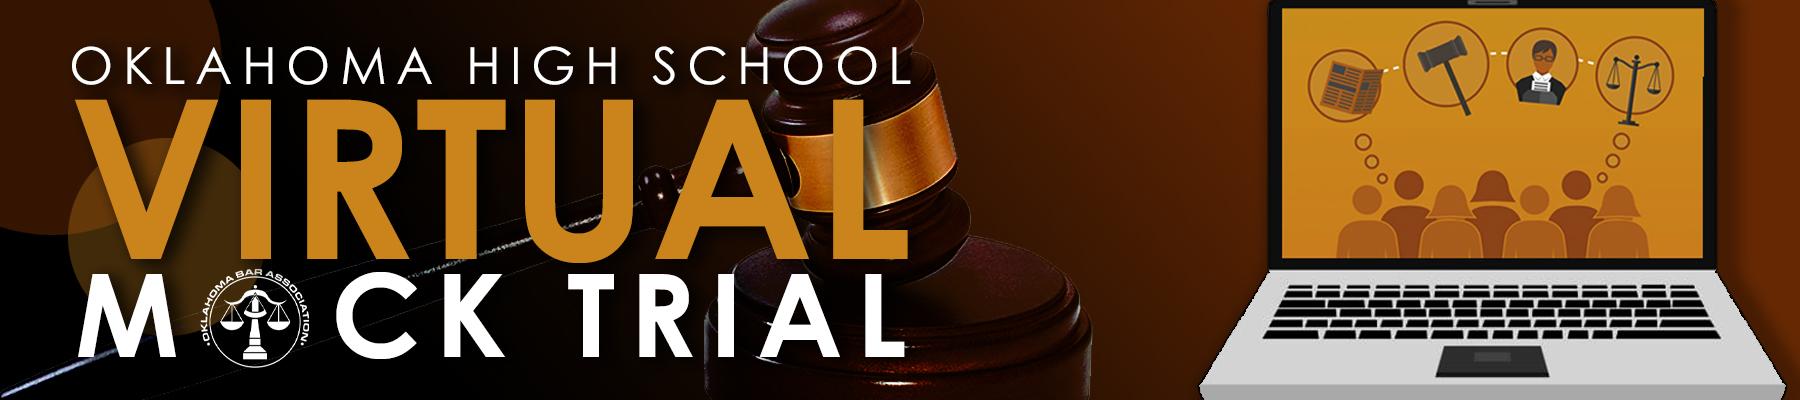 OK Virtual Mock Trial Banner Copy